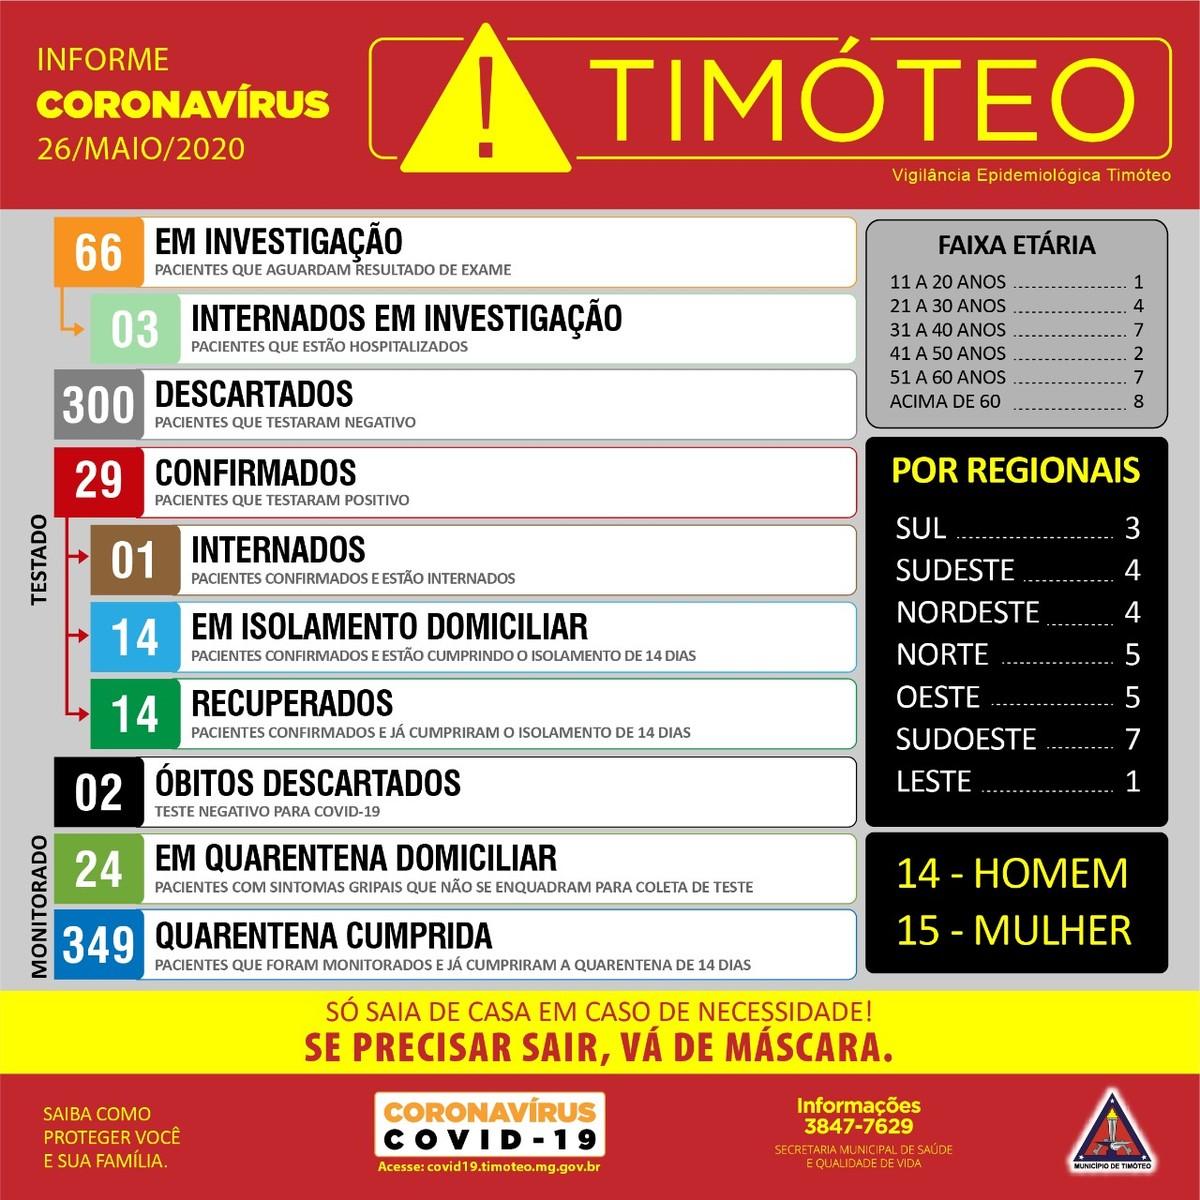 Prefeitura de Timóteo confirma cinco novos casos de coronavírus no município